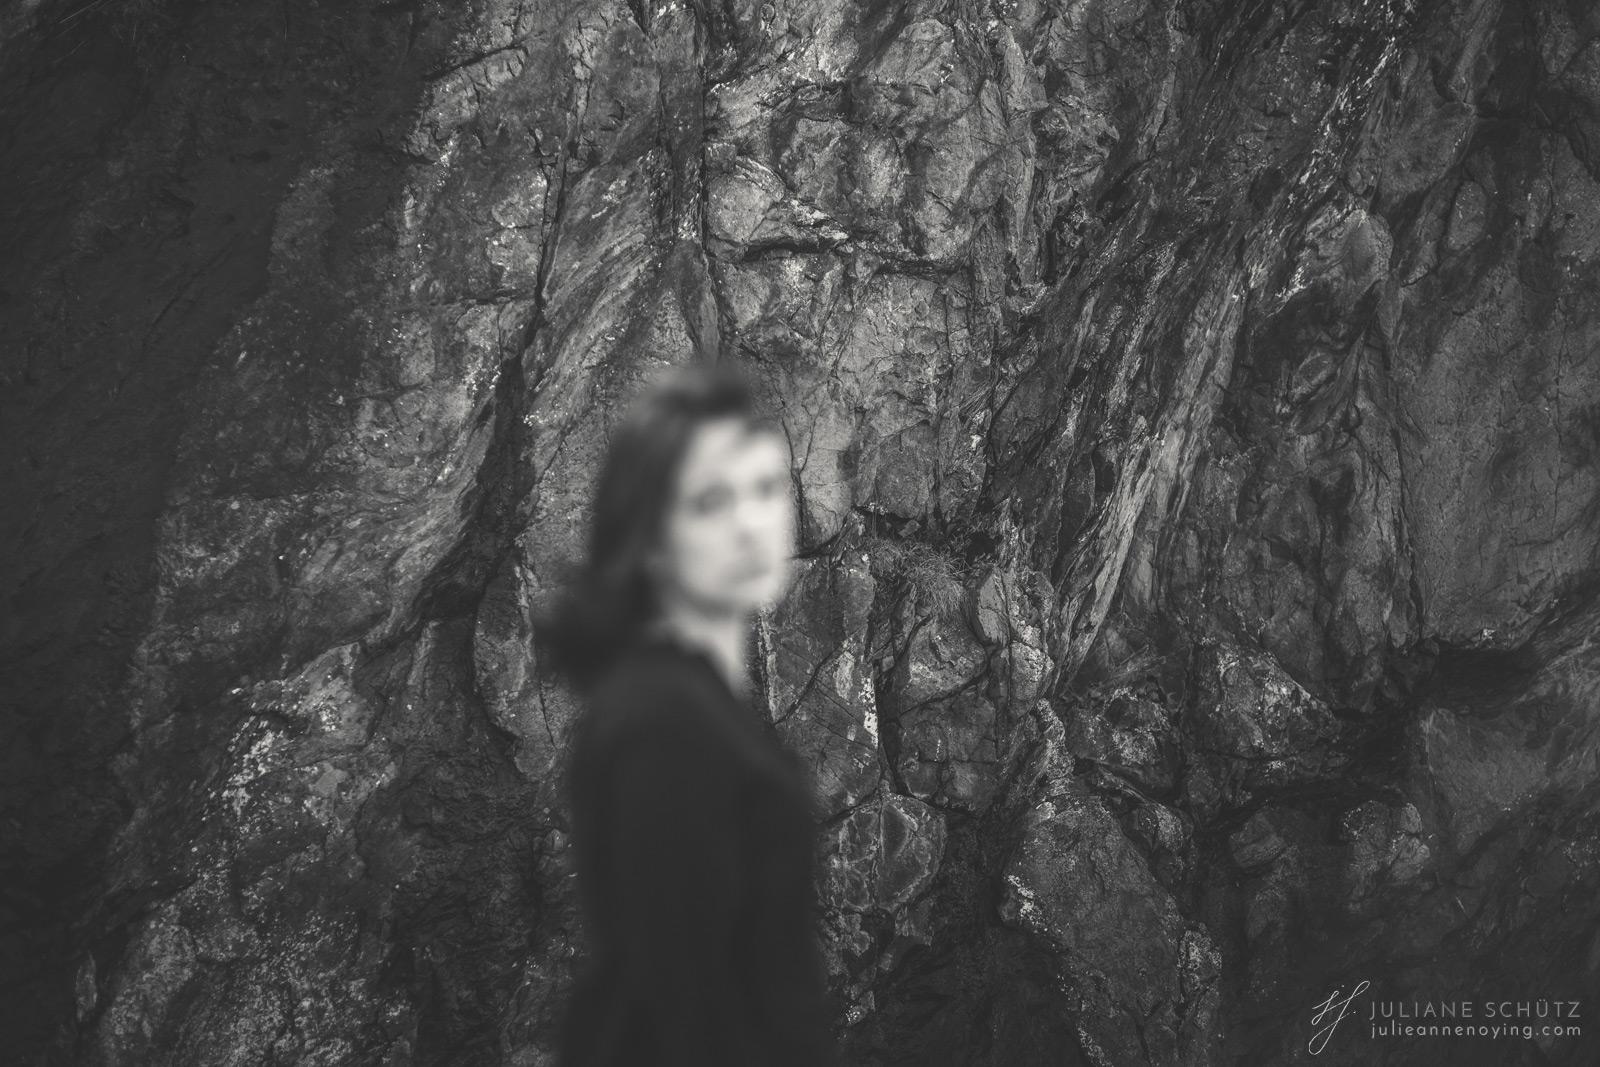 Marianne Baoudouin Lie | © Juliane Schütz